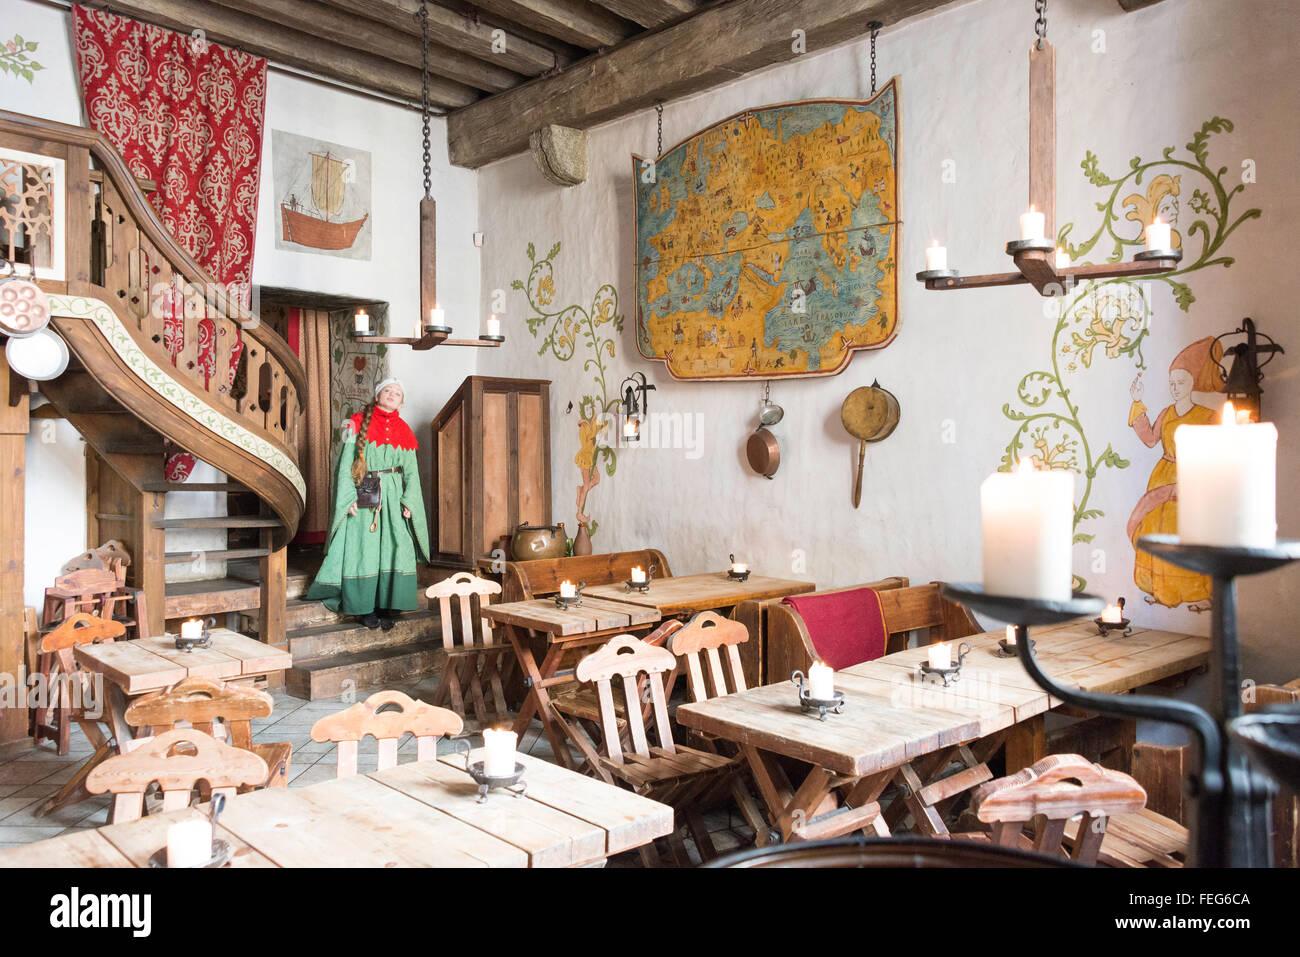 Interior of Olde Hansa Medieval Restaurant, Old Town, Tallinn, Harju County, Republic of Estonia - Stock Image